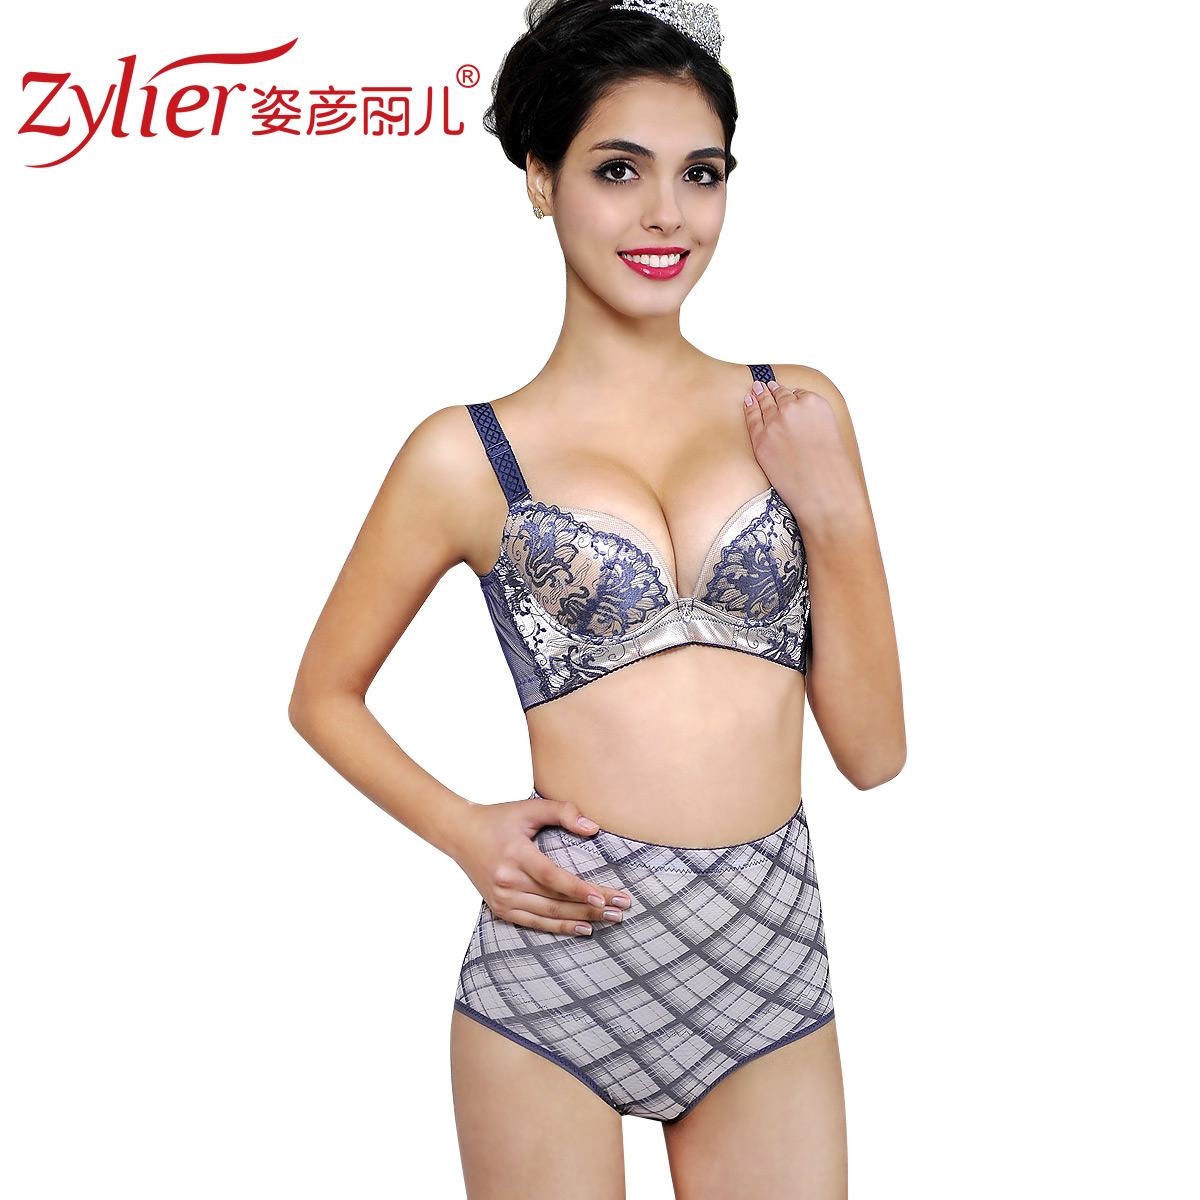 Women's mid waist magic abdomen drawing pants butt-lifting body shaping pants beauty care pants shorts sk31